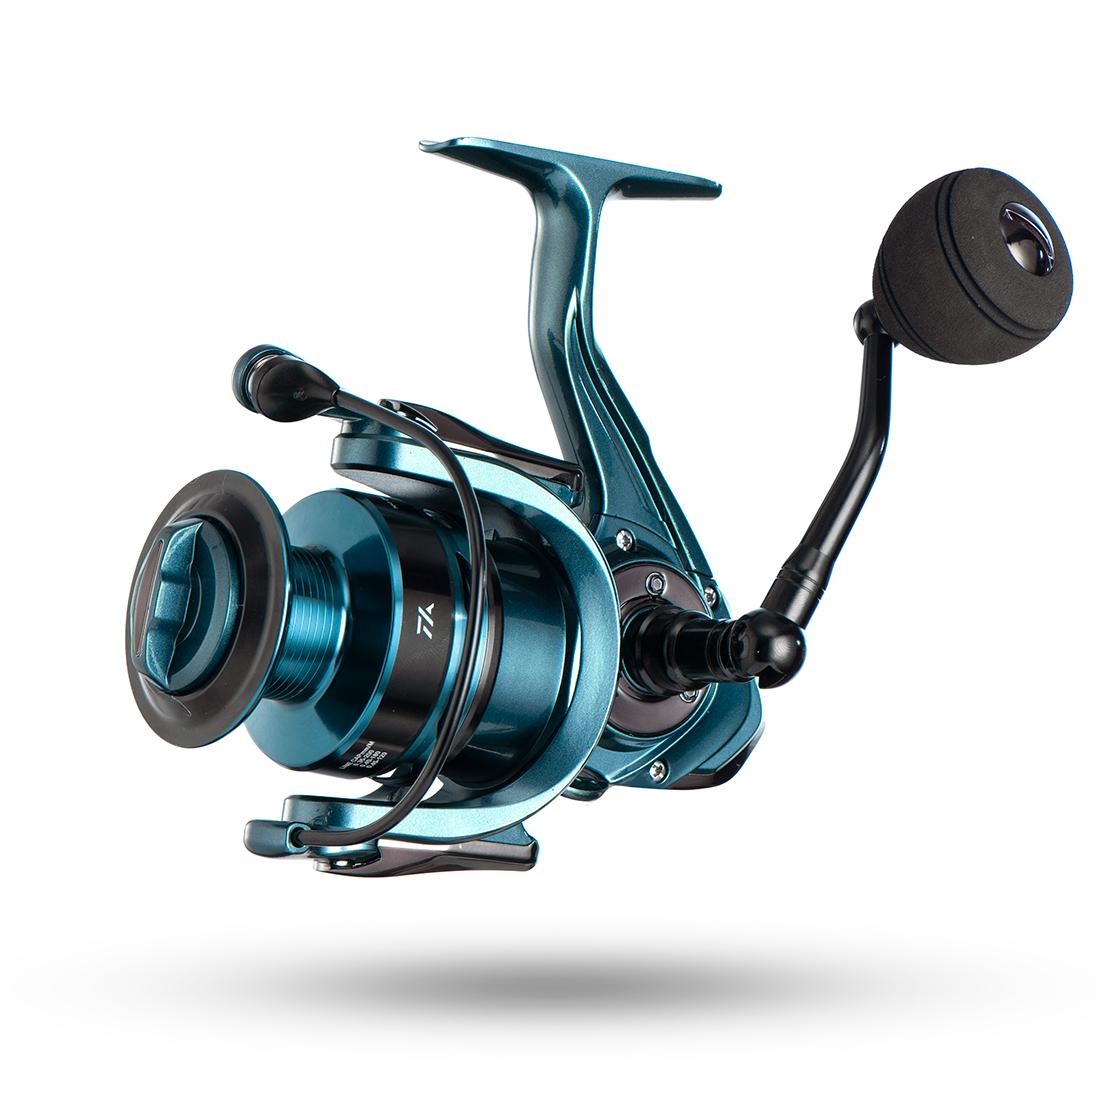 Fishing Reel 14+1BB Deep Spool 5.5:1 4.7:1 Gear Ratio High Speed Spinning Reel Casting reel Carp For Saltwater 4000 D deep cup